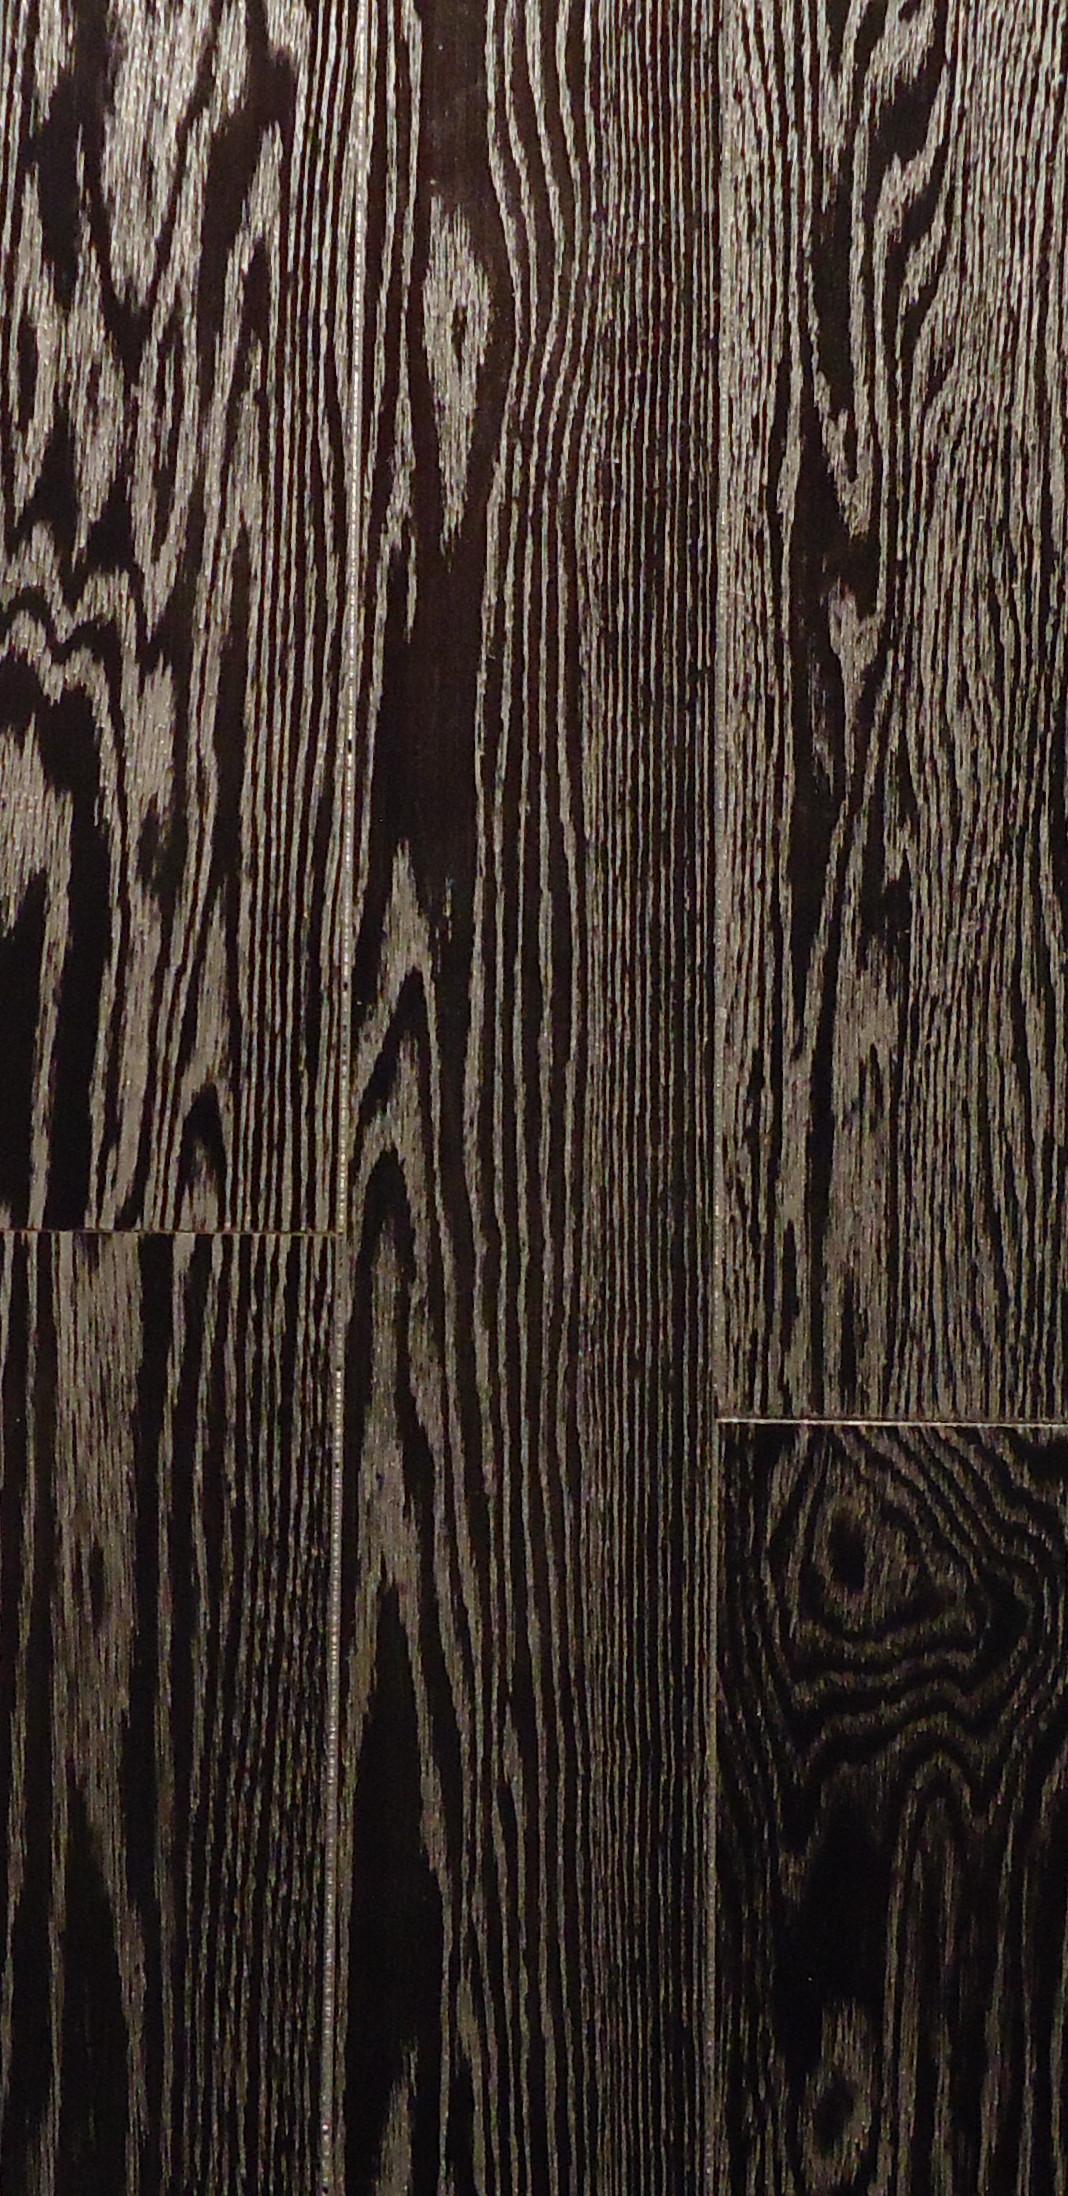 28 Ideal Hardwood Floor Installation Brooklyn 2021 free download hardwood floor installation brooklyn of pidfloors com woodic2bcc288aec29cc2a8cc29bic2bcc289 pinterest woods interiors and room for wood flooring ac2b7 pidfloors com